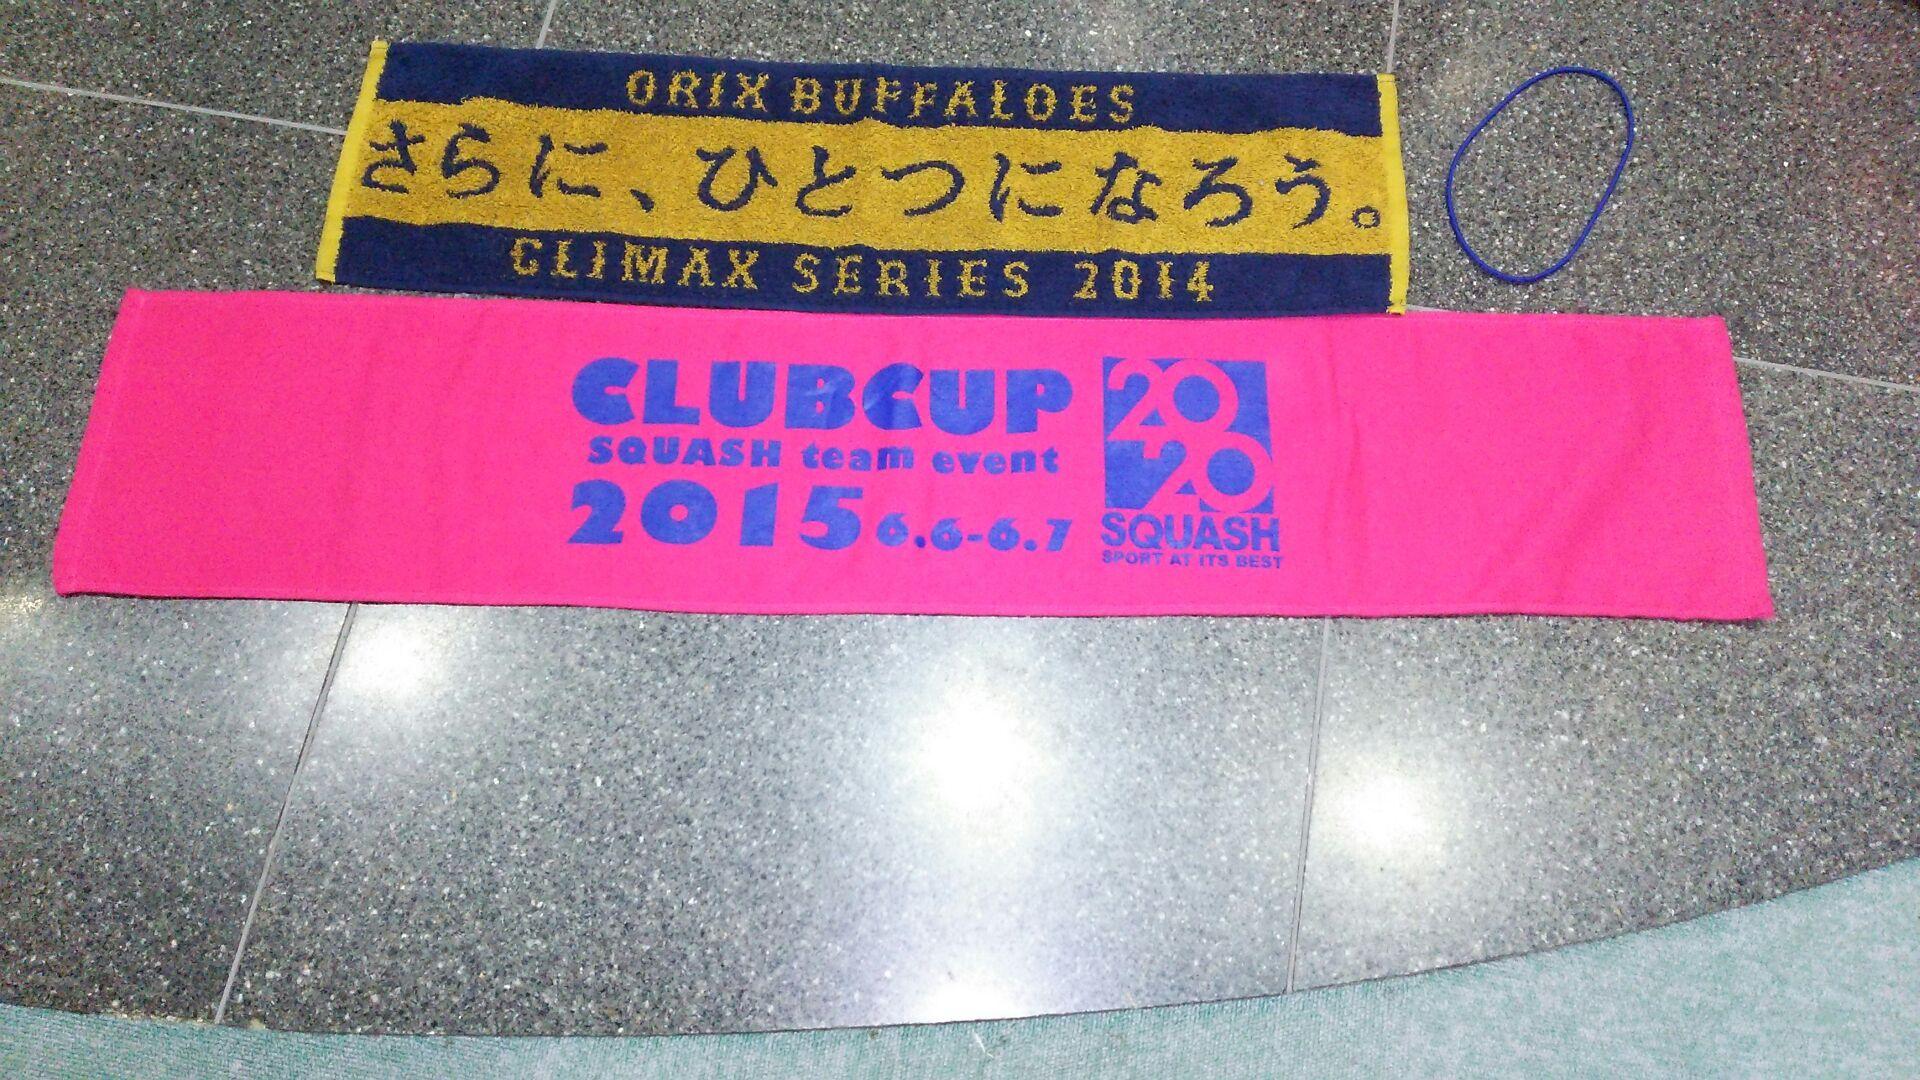 jt_150606_2015clubcup_op_team_lost